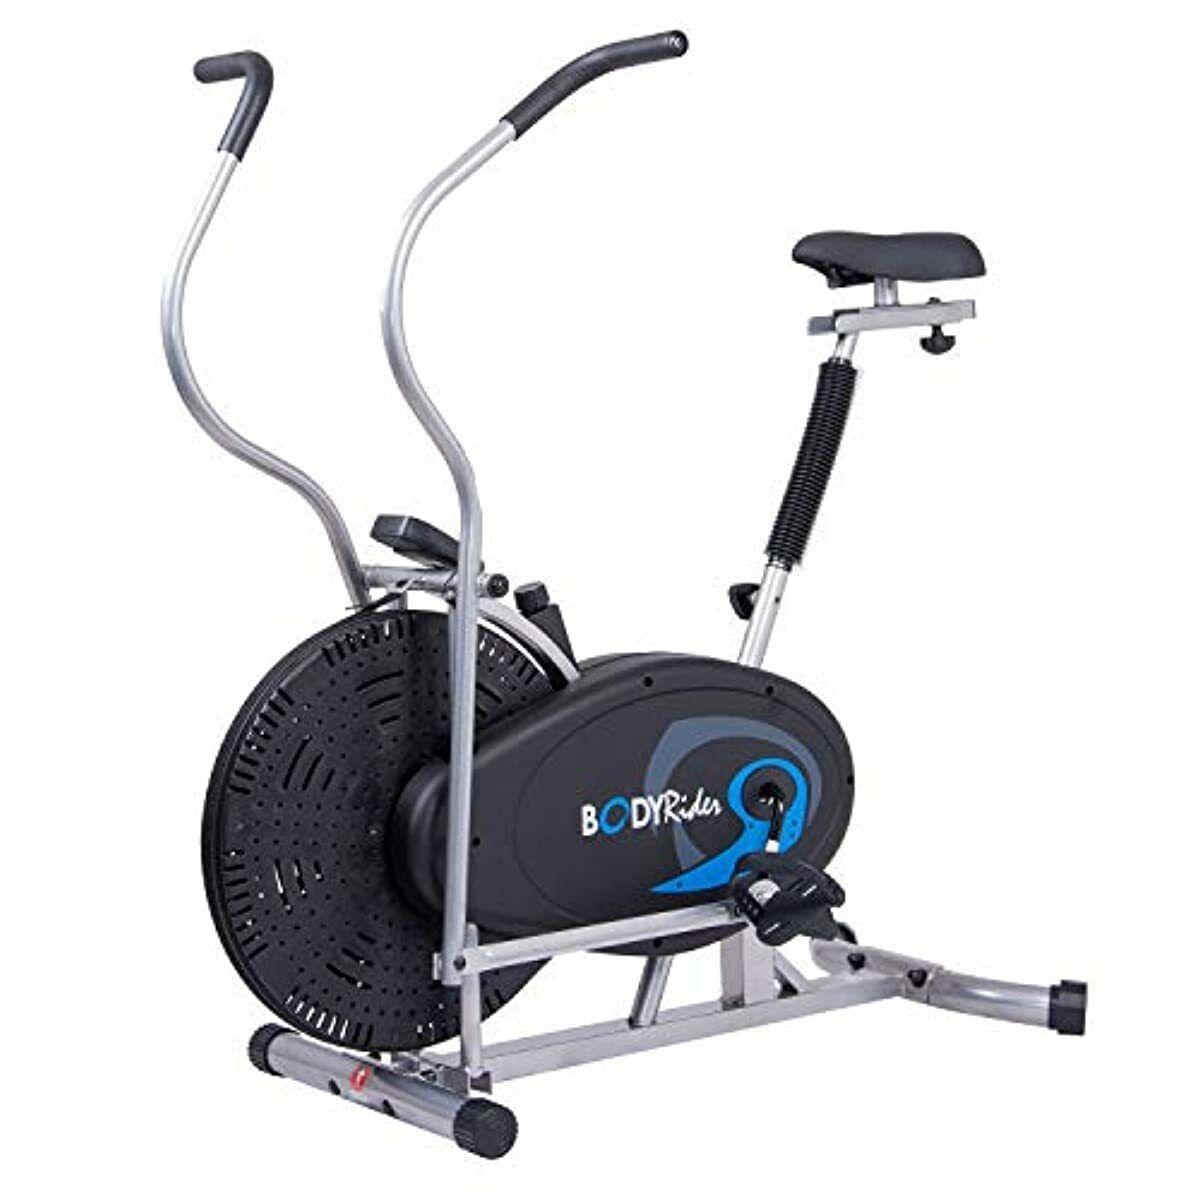 Body Rider Body Flex Sports Upright Exercise Fan Bike: Indoo